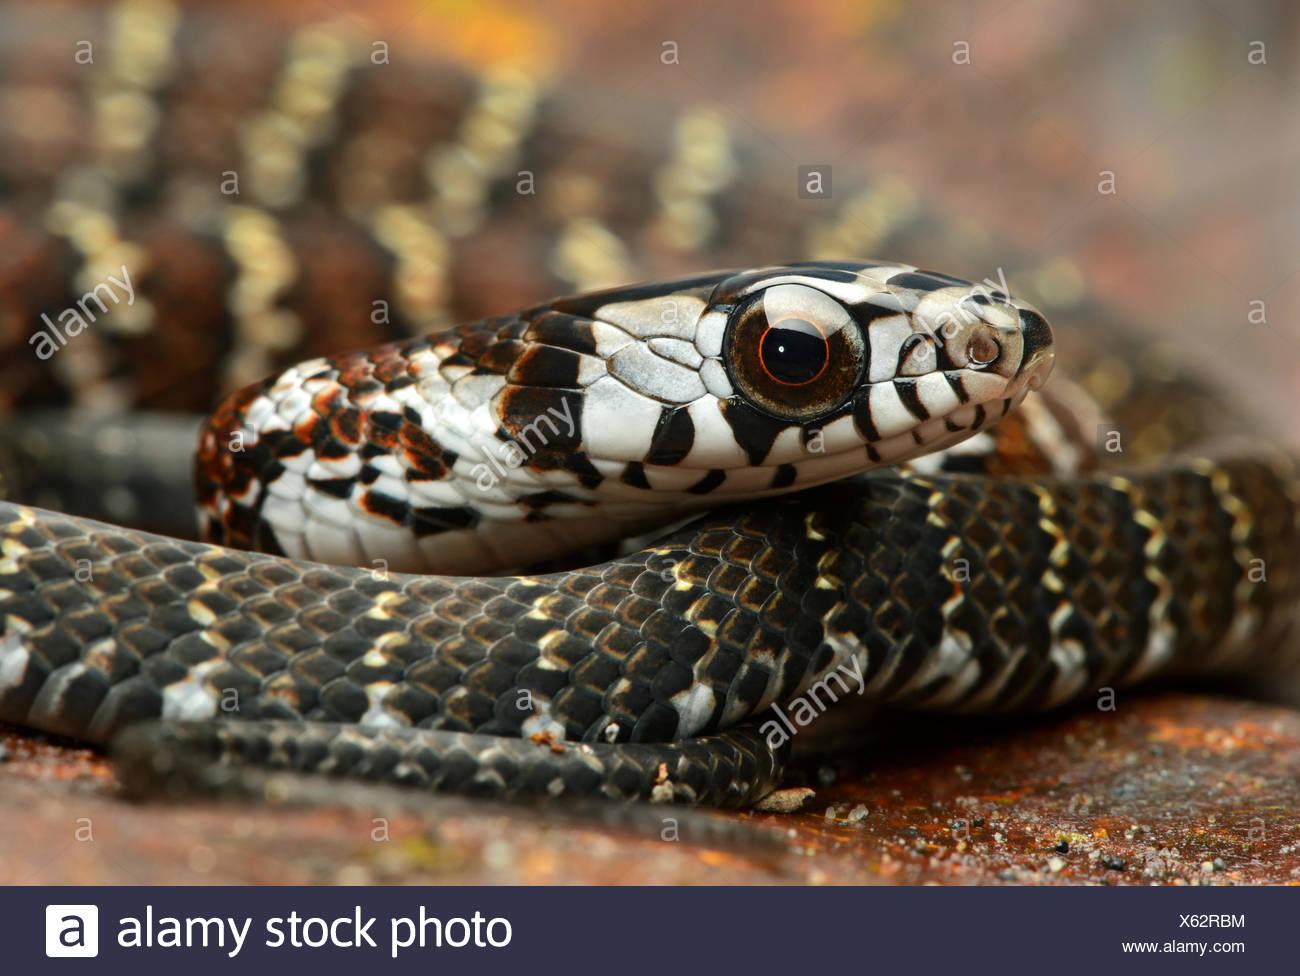 Tawny Forest Racer (Dendrophidion dendrophis), snake (Colubridae), Amazon rainforest, Yasuni National Park, Ecuador - Stock Image